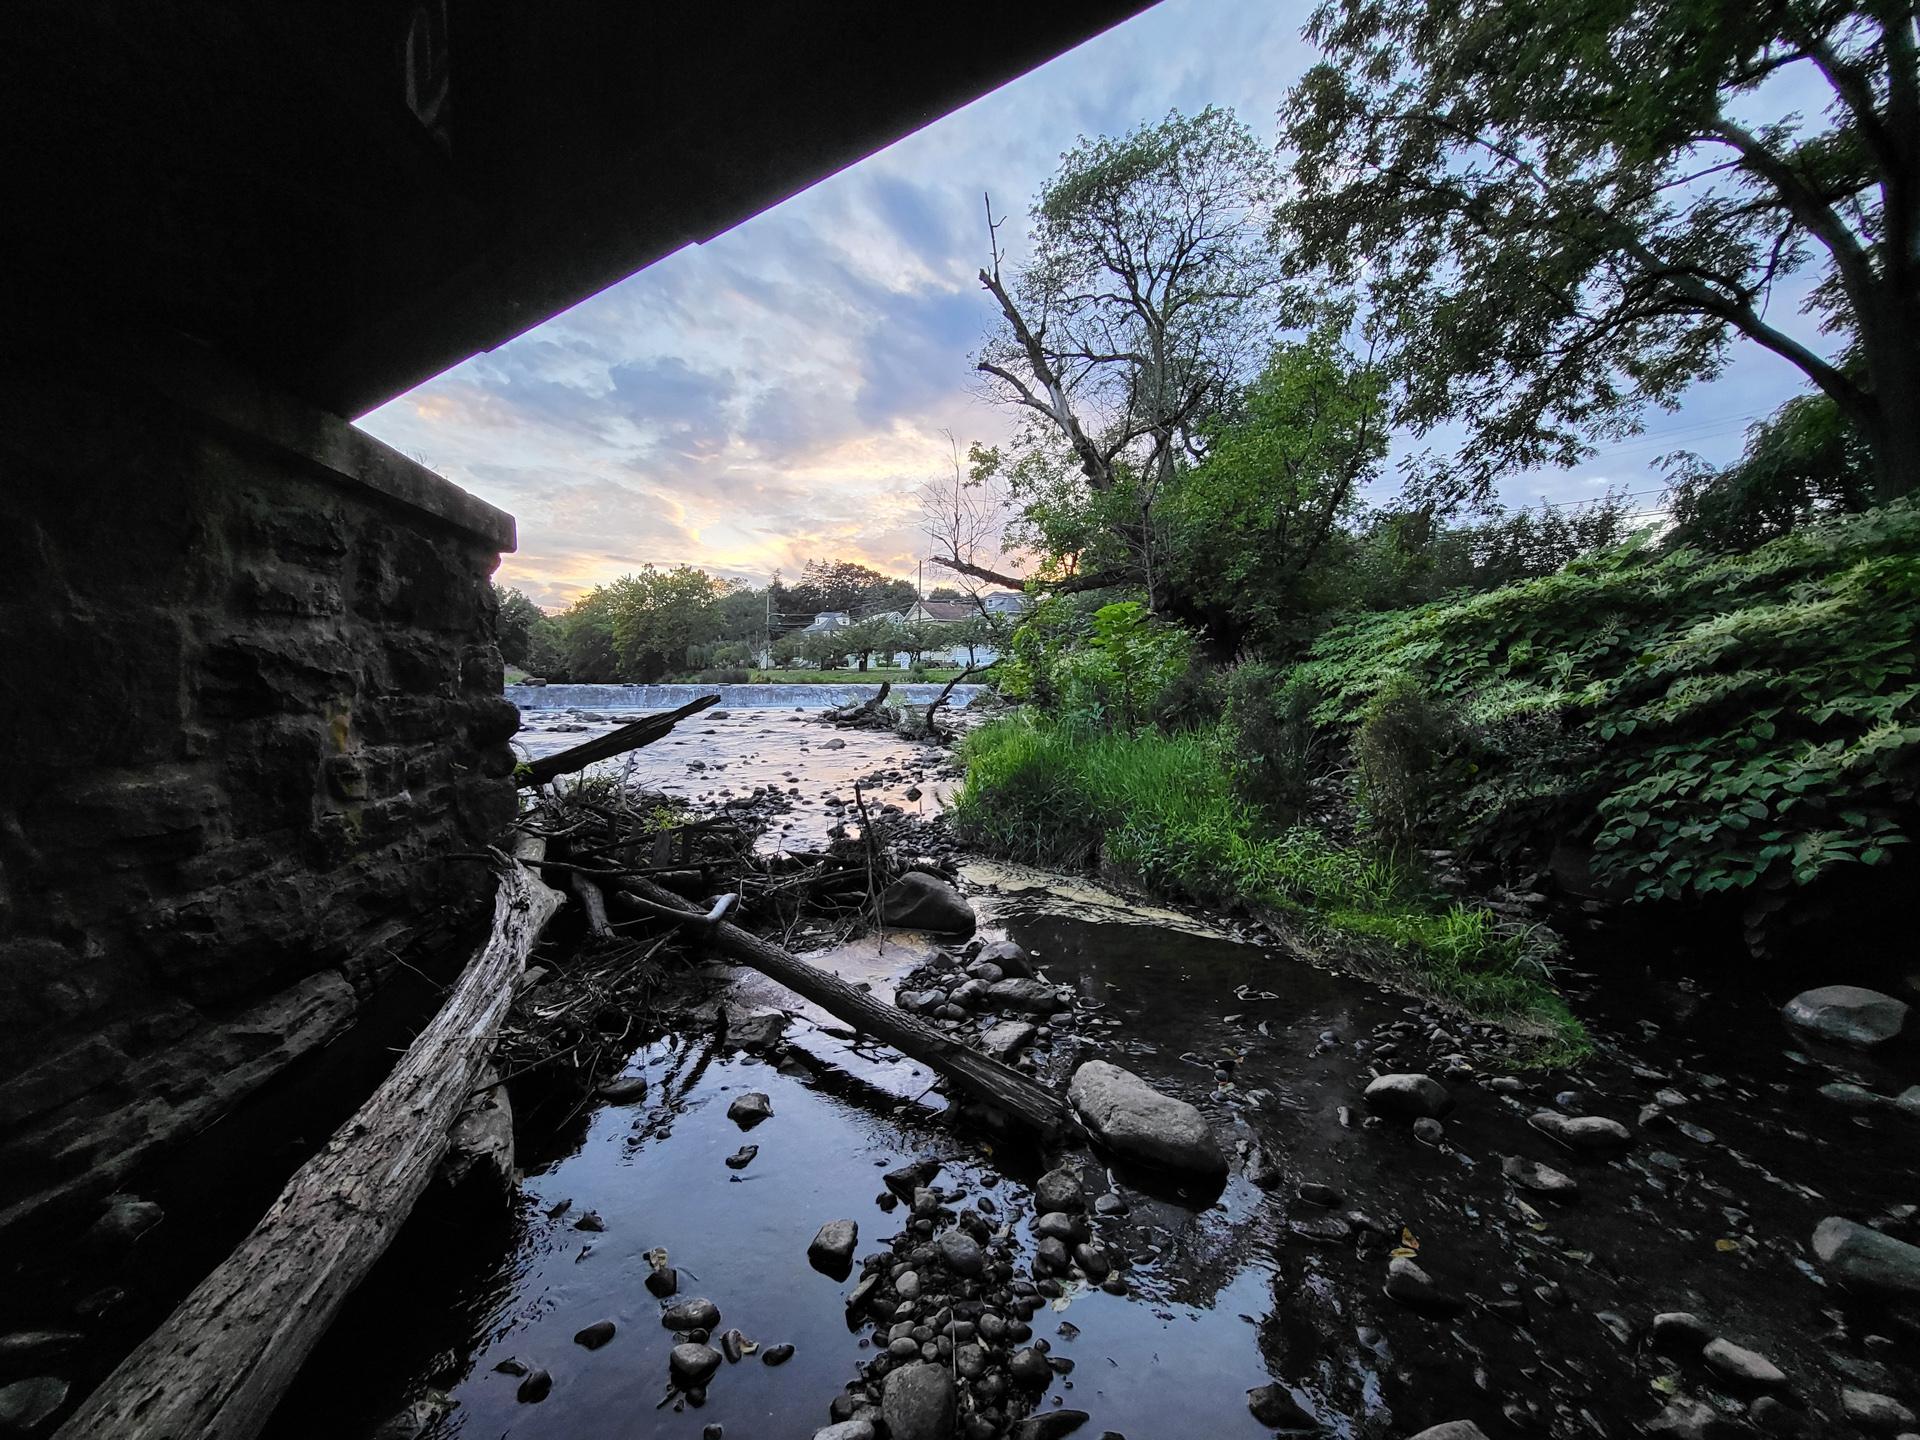 Samsung Galaxy Z Flip 3 photo sample bridge at dusk wide angle